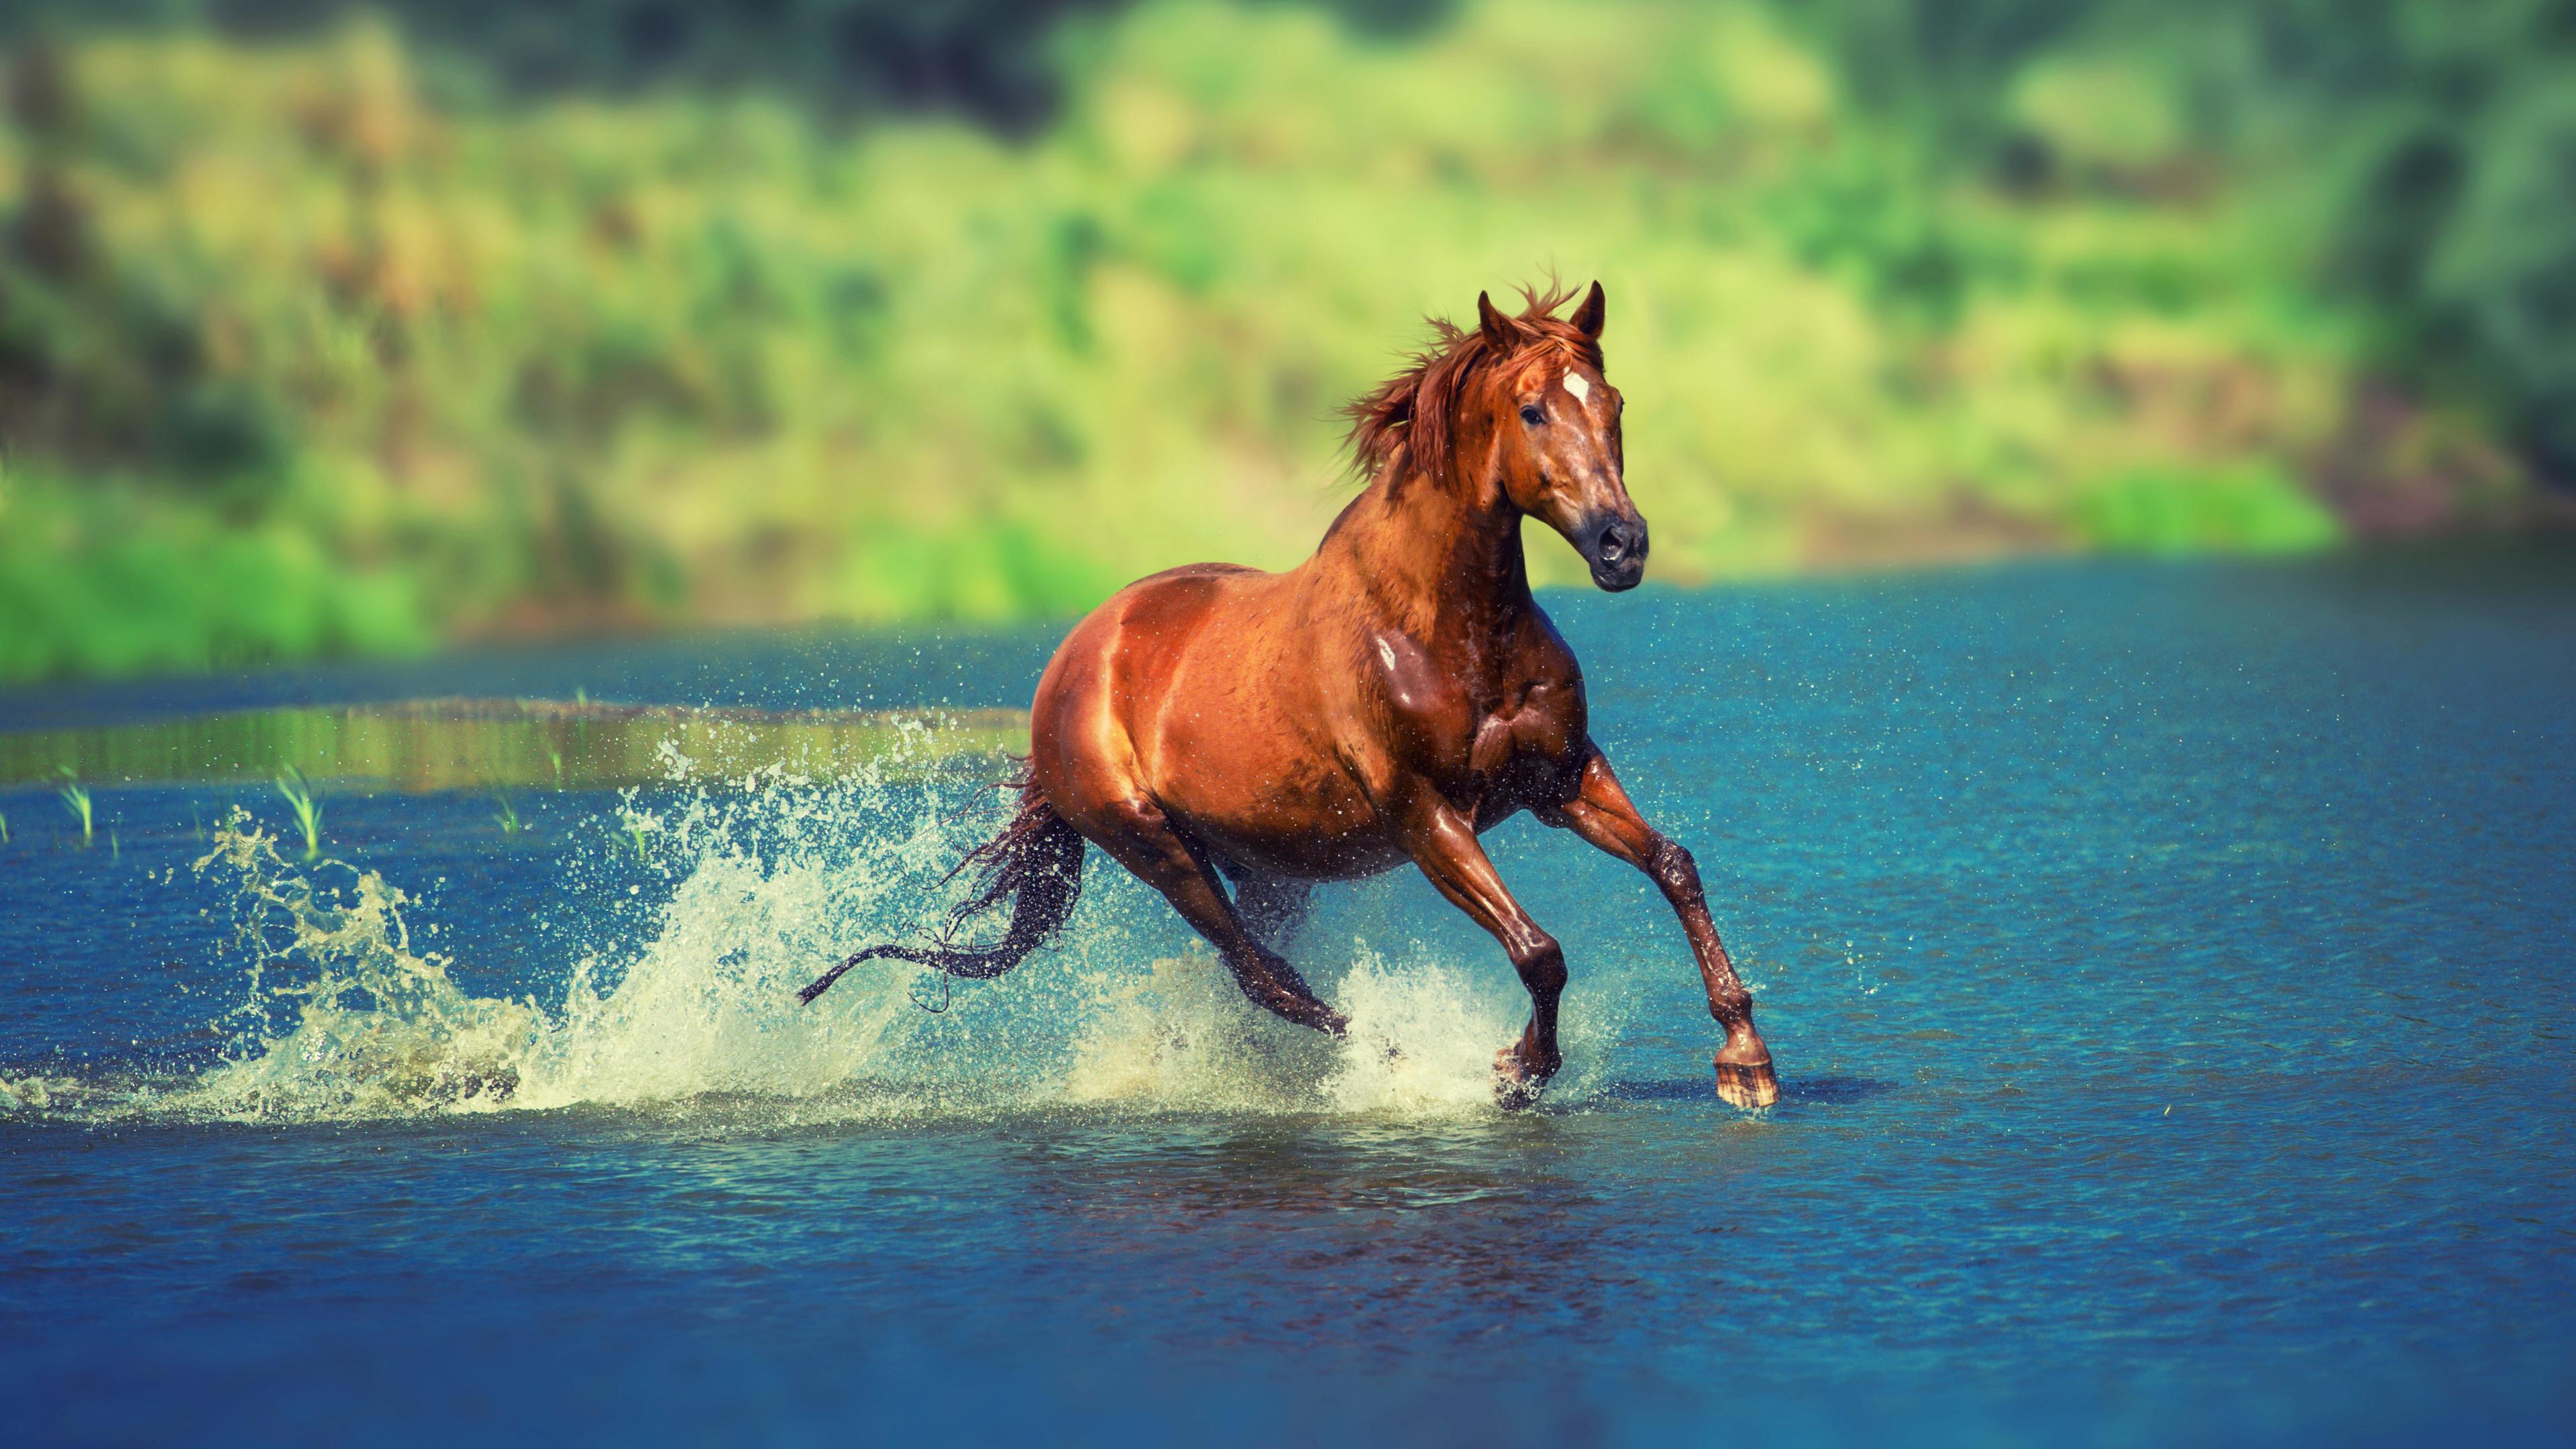 Wallpaper 4k Running Horse In Water 4k Animals Wallpapers Horse Wallpapers